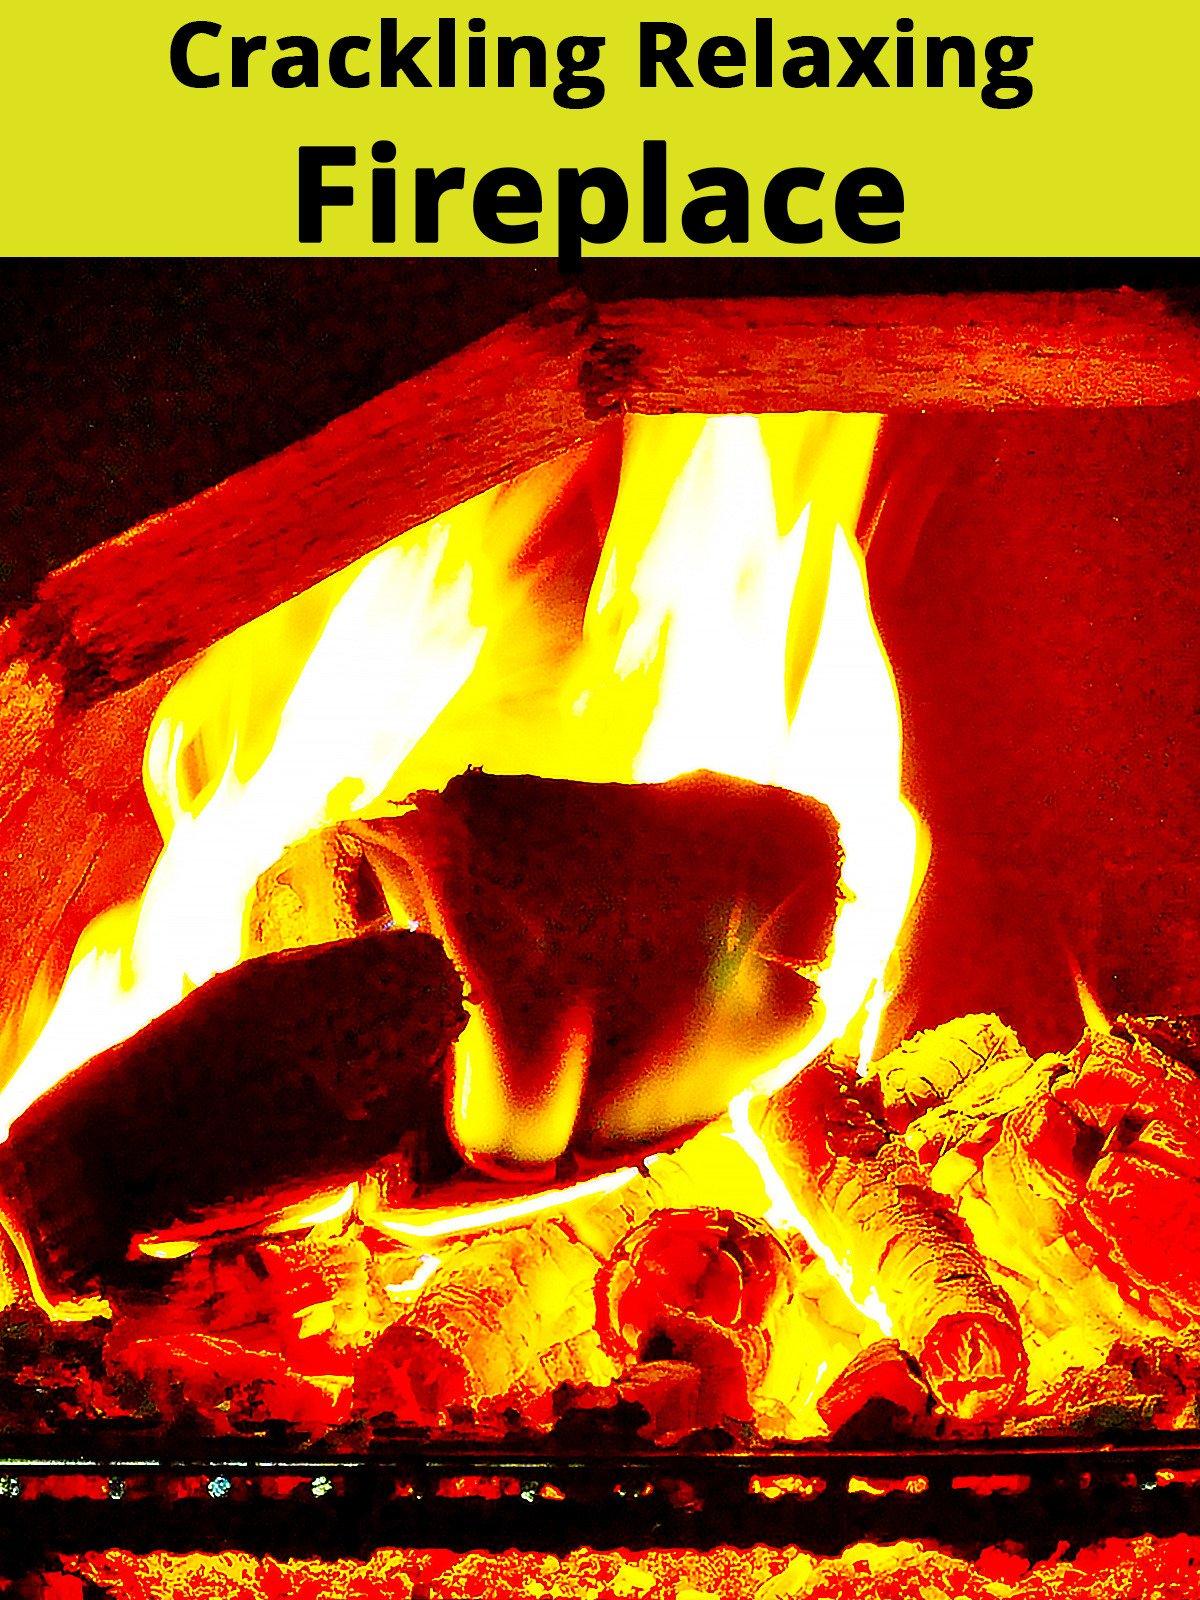 Crackling Relaxing Fireplace